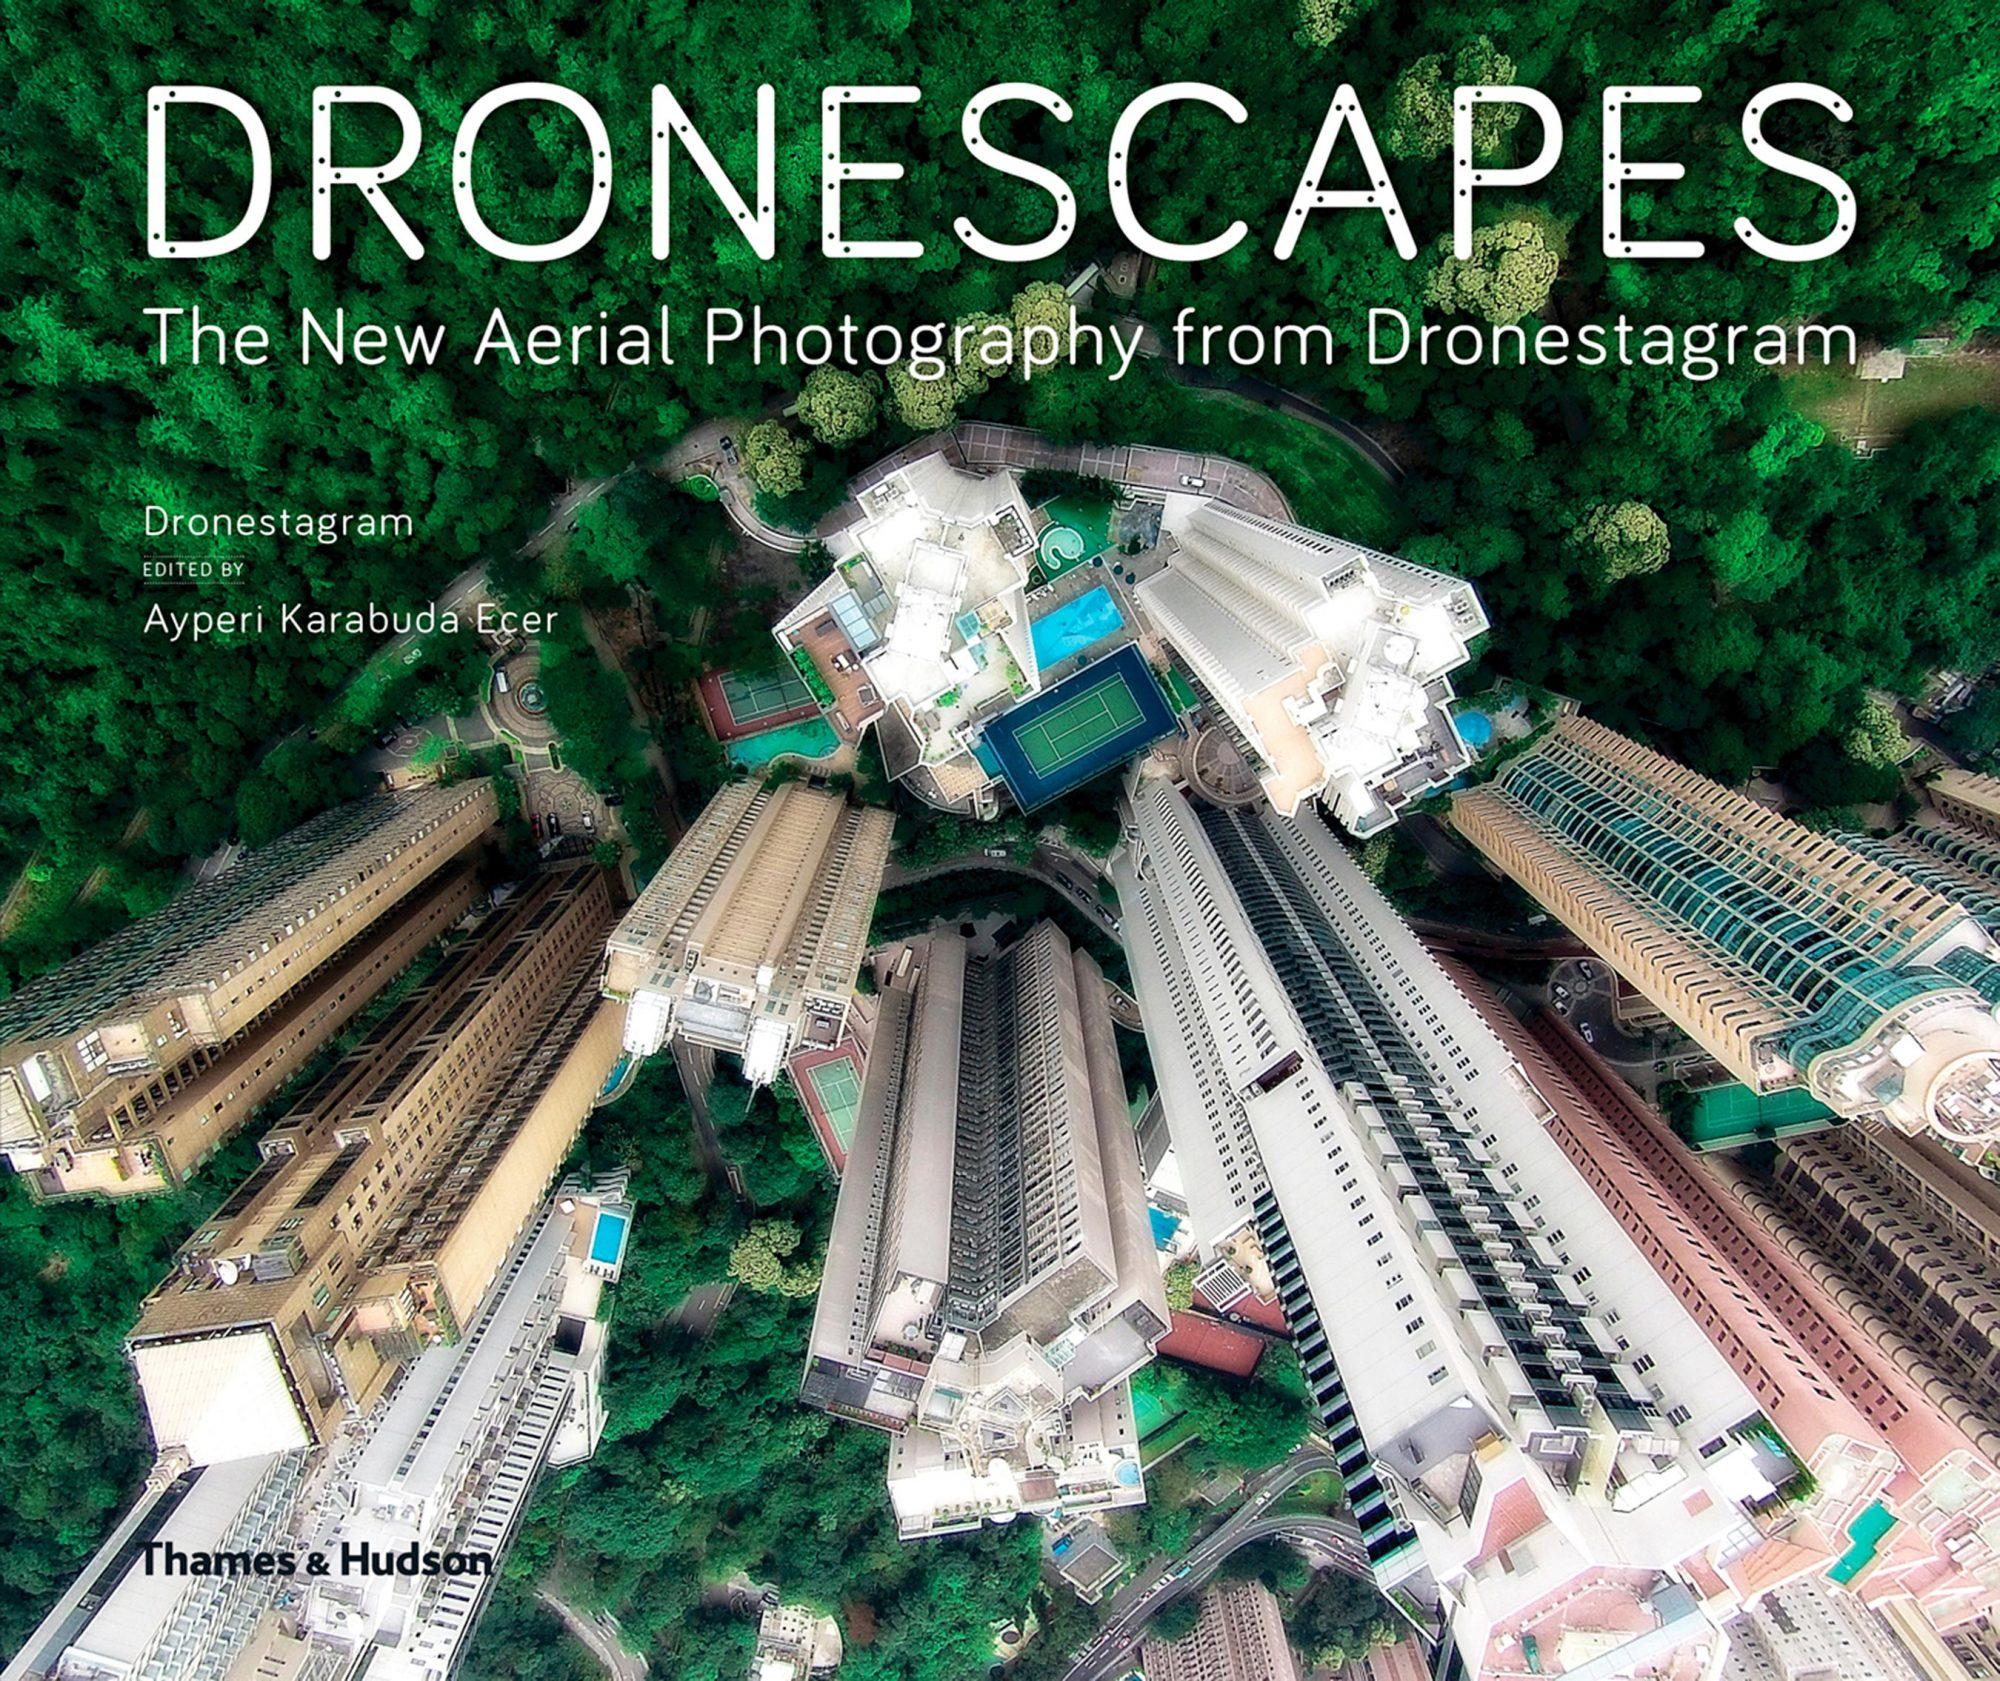 Dronescapes 9780500544723.JPG